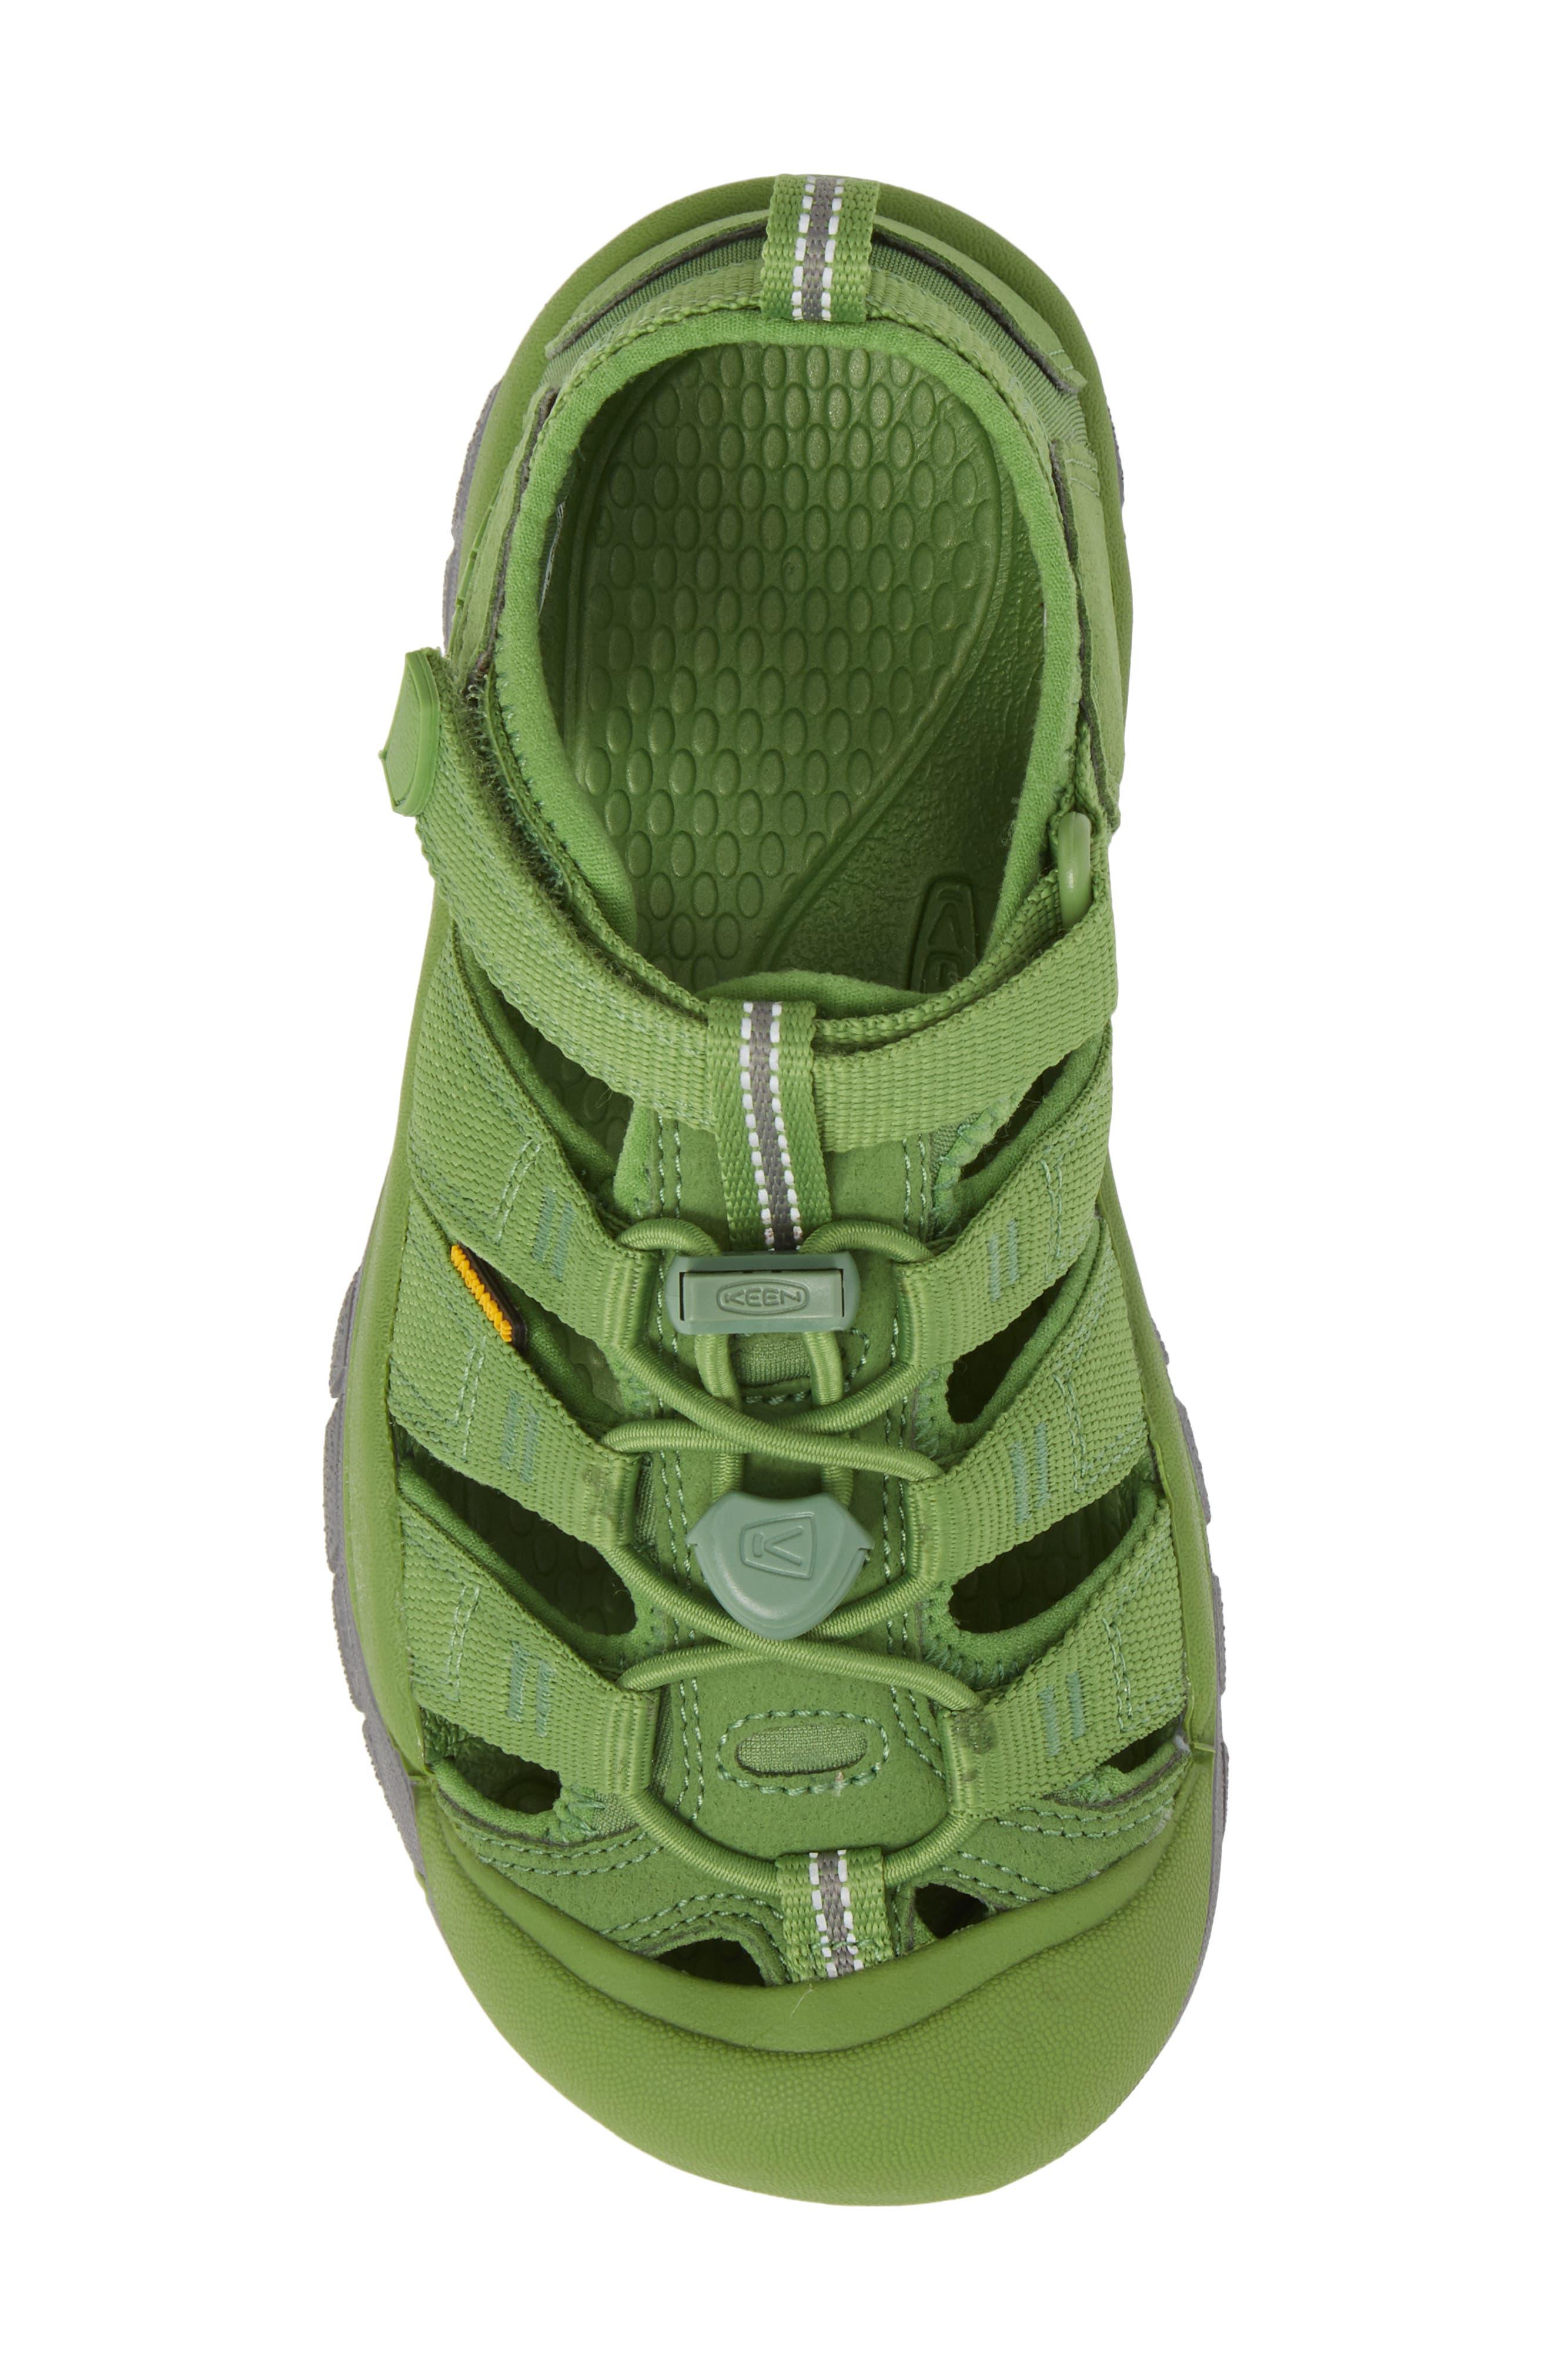 KEEN NEWPORT H2 1014259 CRUSHED BRONZE GREEN YOUTH SANDAL